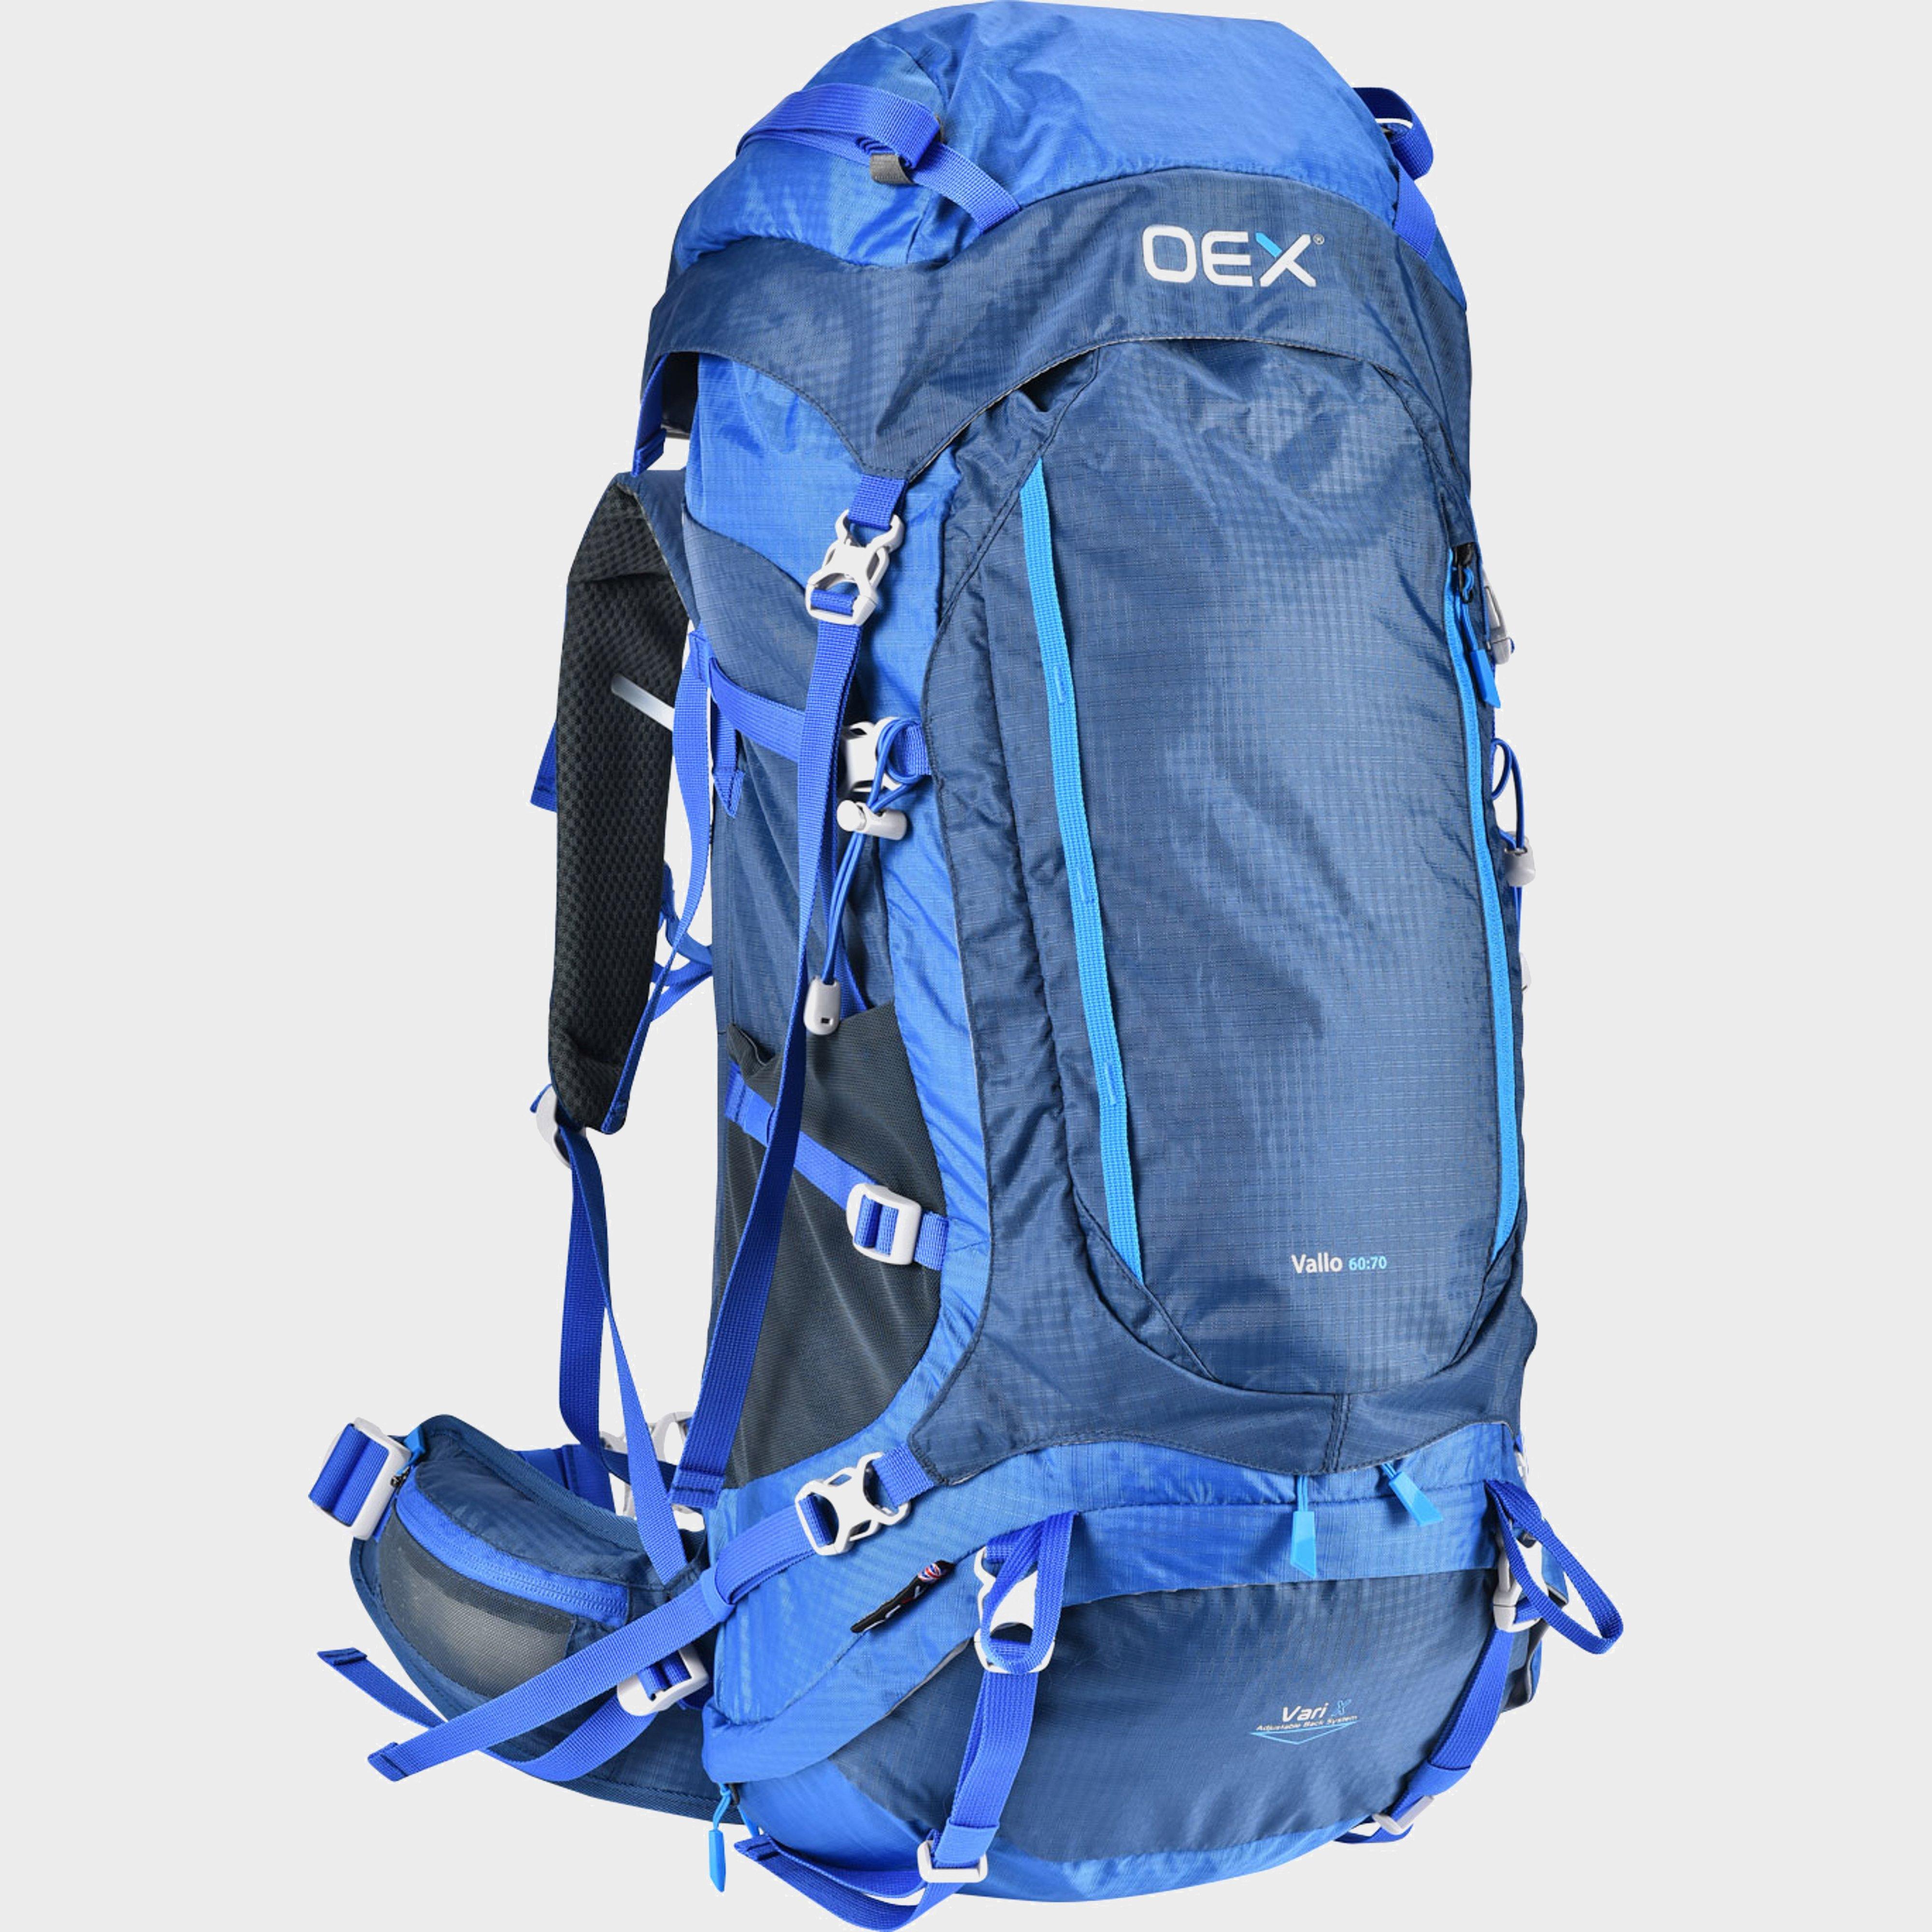 Oex Oex Vallo EXP 60:70 Rucksack - Blue, Blue